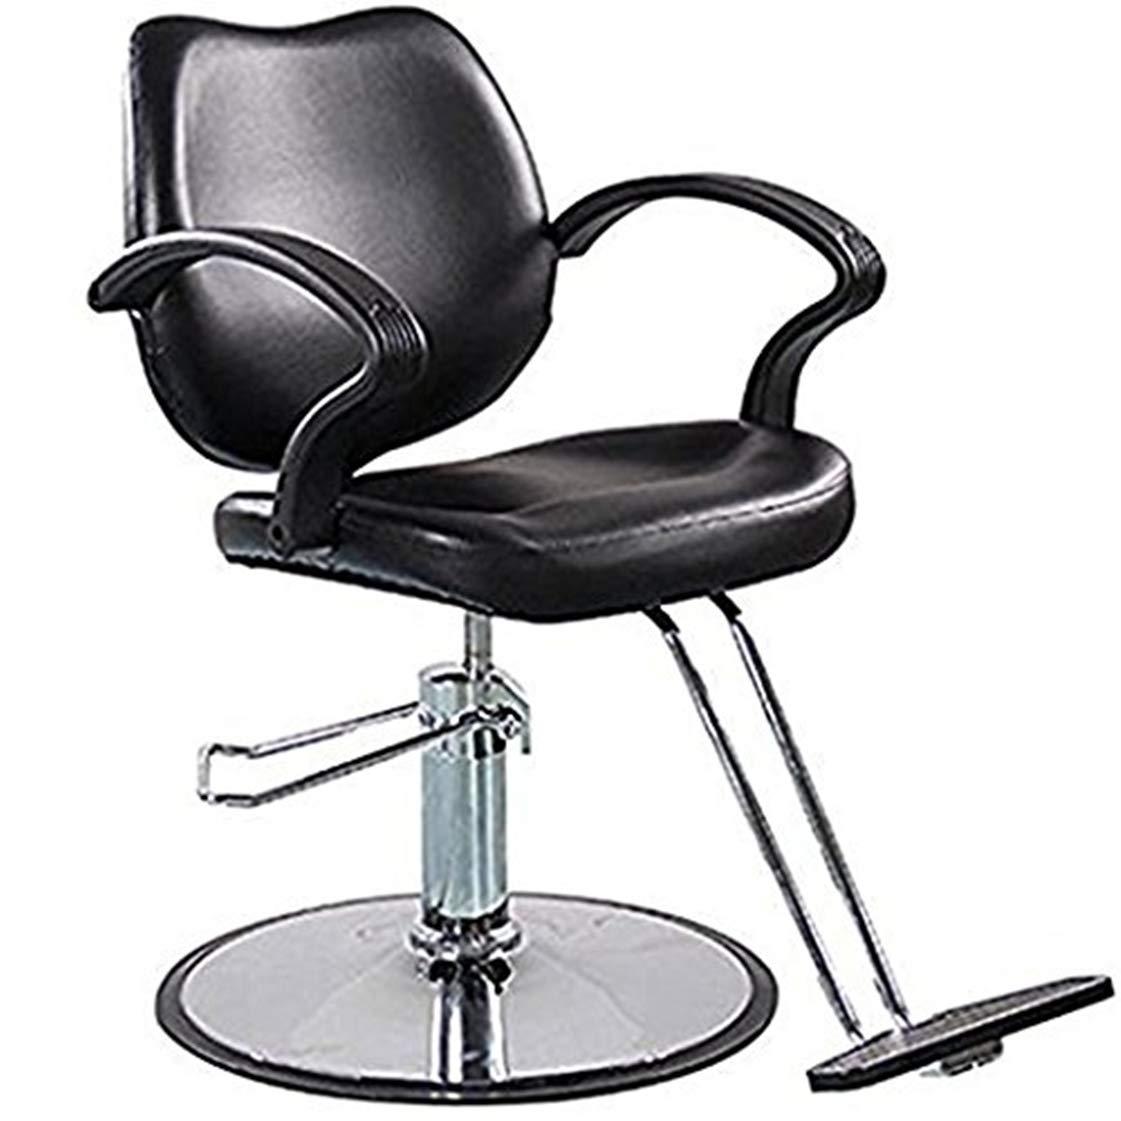 Funnylife Hair Salon Chair Styling Heavy Duty Hydraulic Pump Barber Chair Beauty Shampoo Barbering Chair for Hair Stylist Women Man by Funnylife